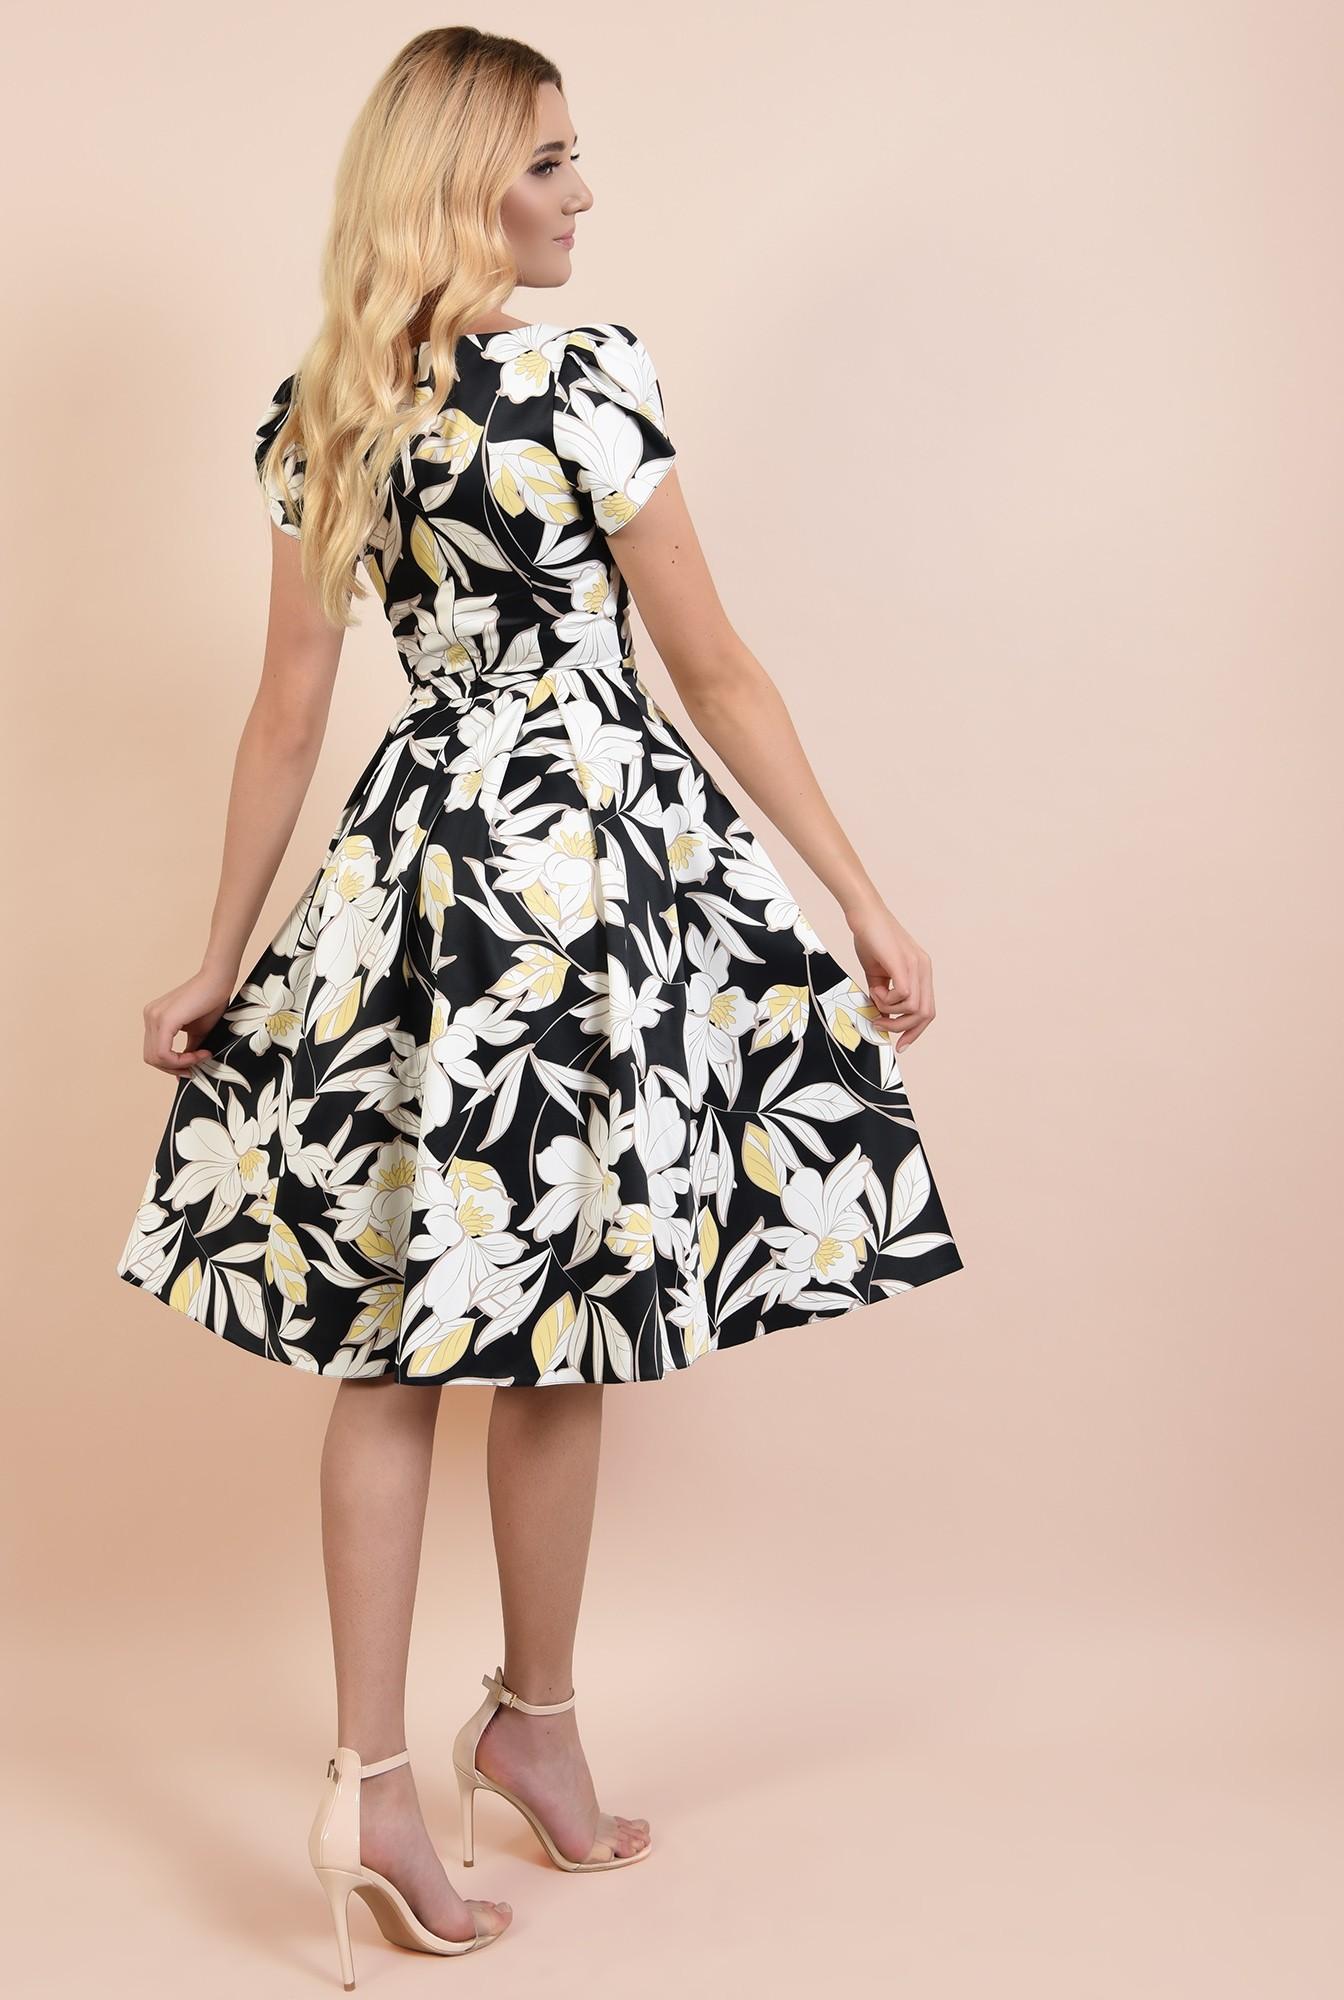 1 - rochie de ocazie, cu motive florale, anchior, maneci bufante lalea